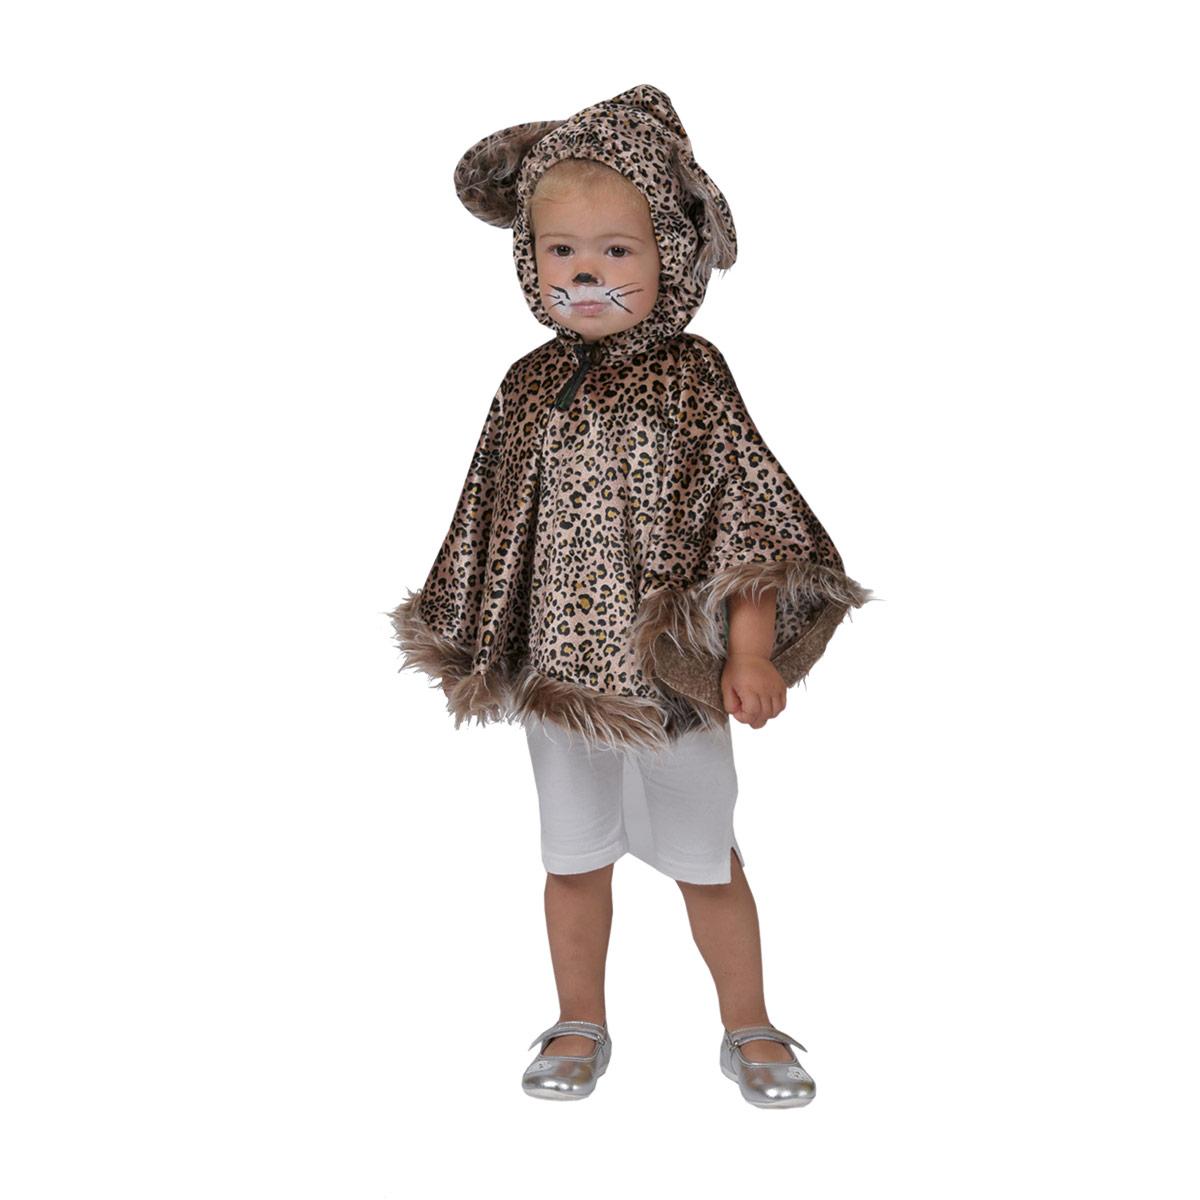 wildkatzen kost m kinder kleinkinder babys kost mplanet. Black Bedroom Furniture Sets. Home Design Ideas